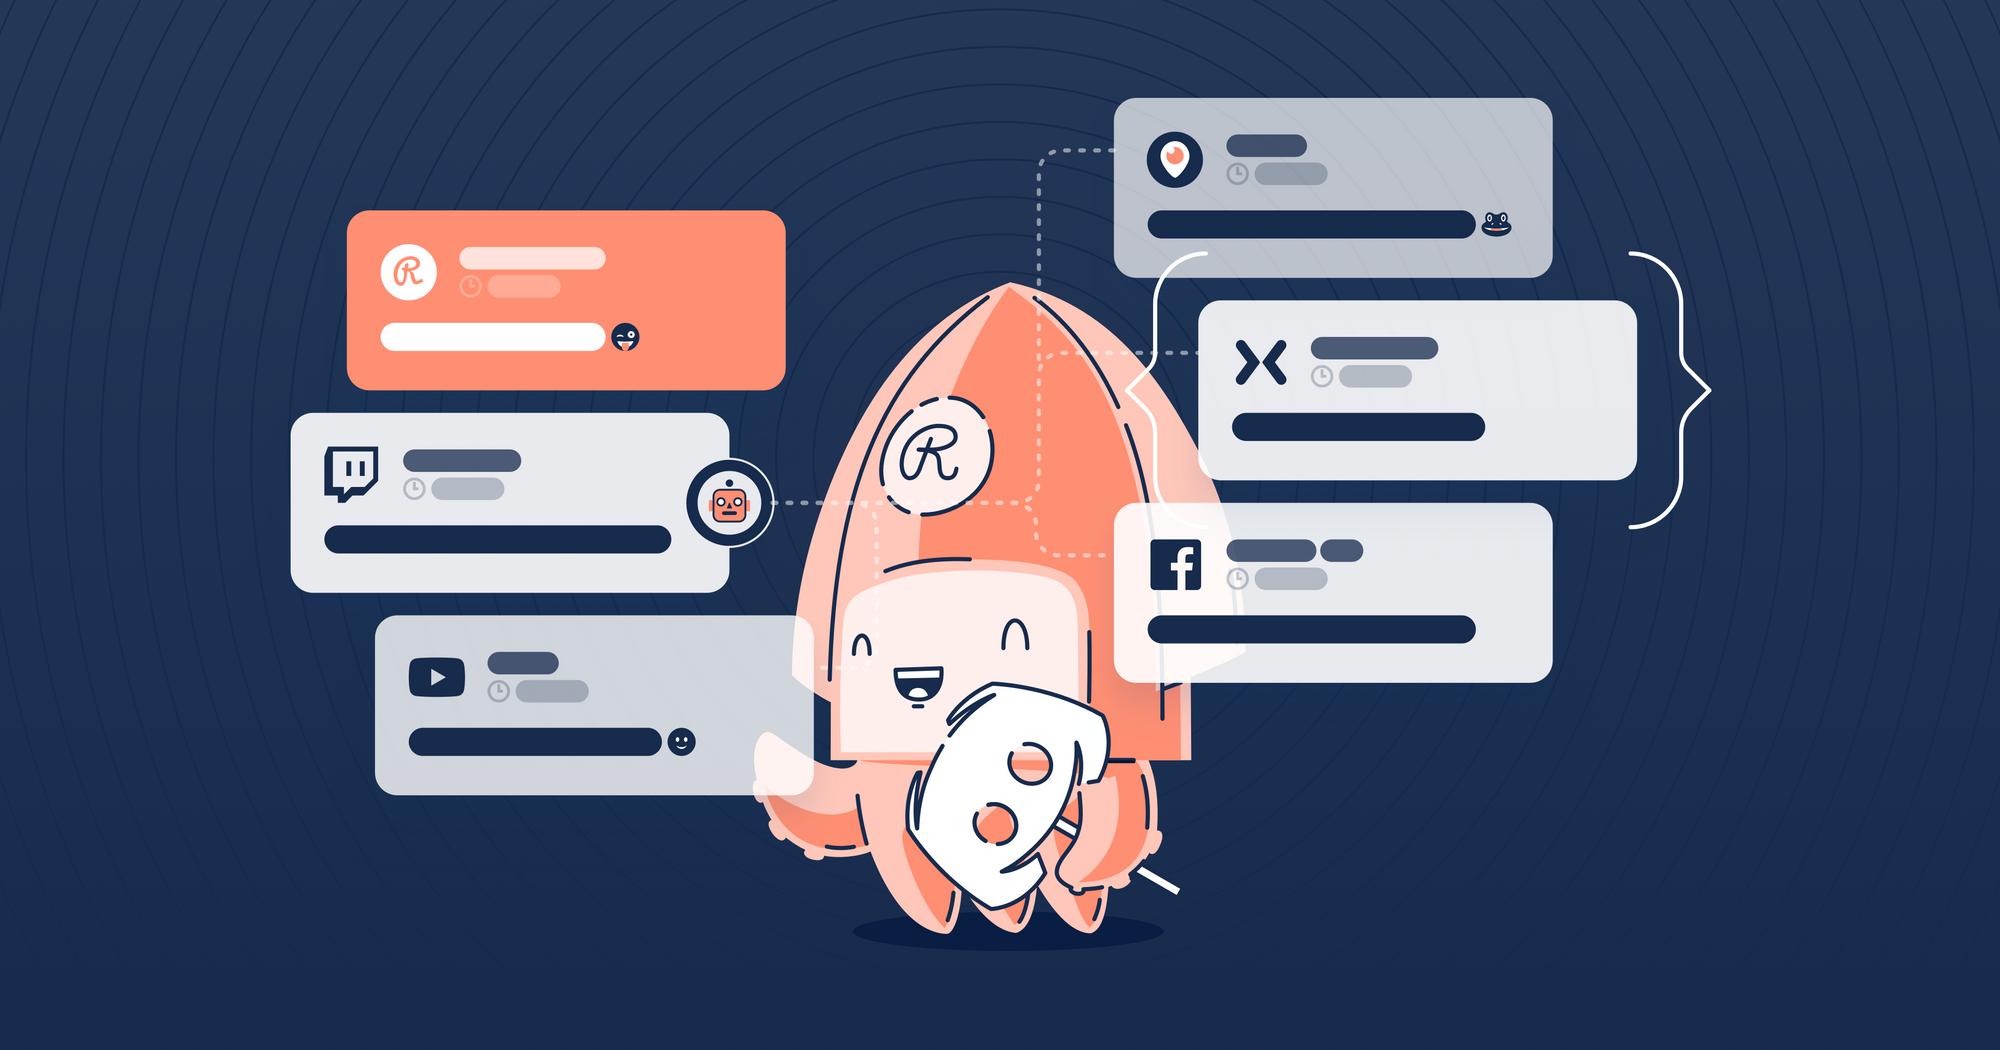 Cross-platform communication with Restream Chat